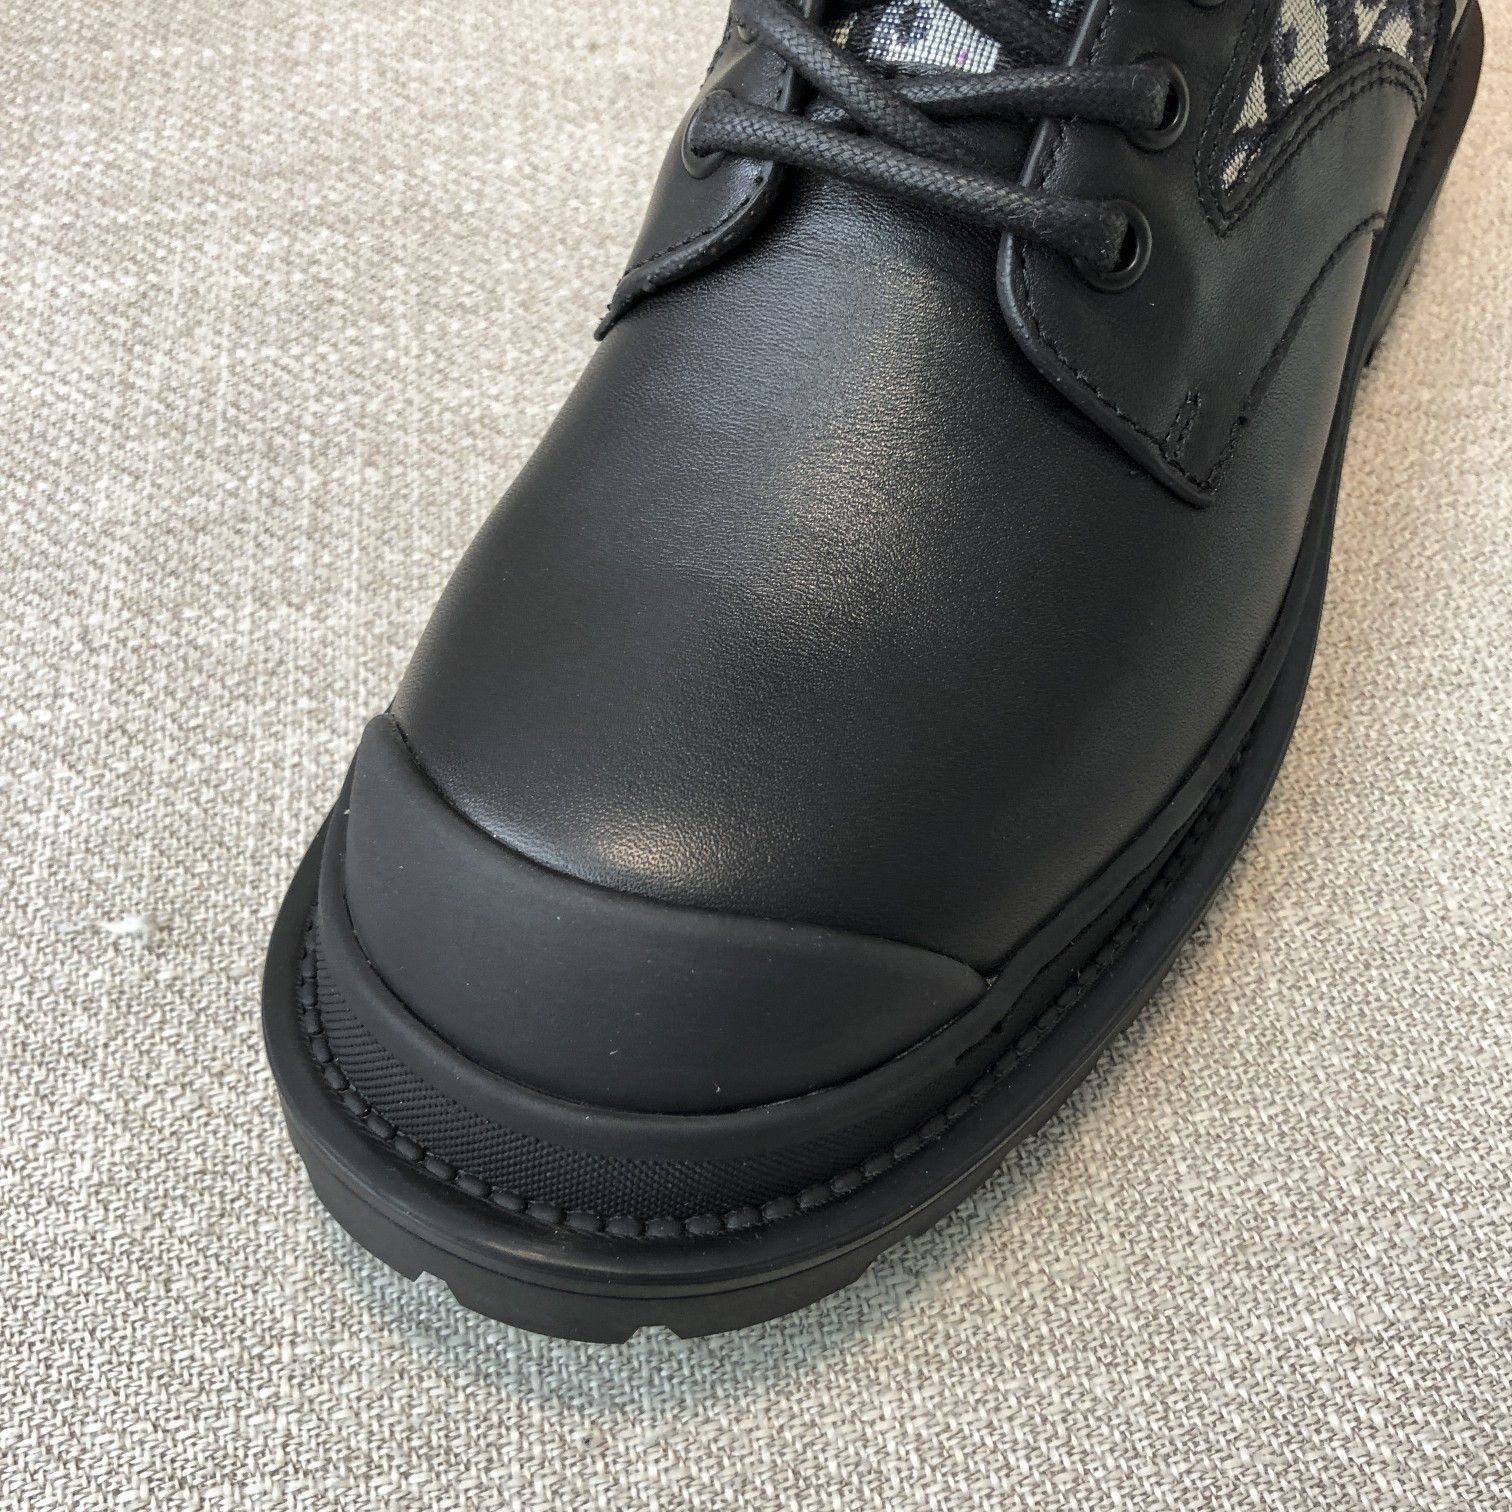 Dior高版本情侣 款2020ss秋冬新款字母厚底系带机车靴,秋冬T台走秀同款(图8)